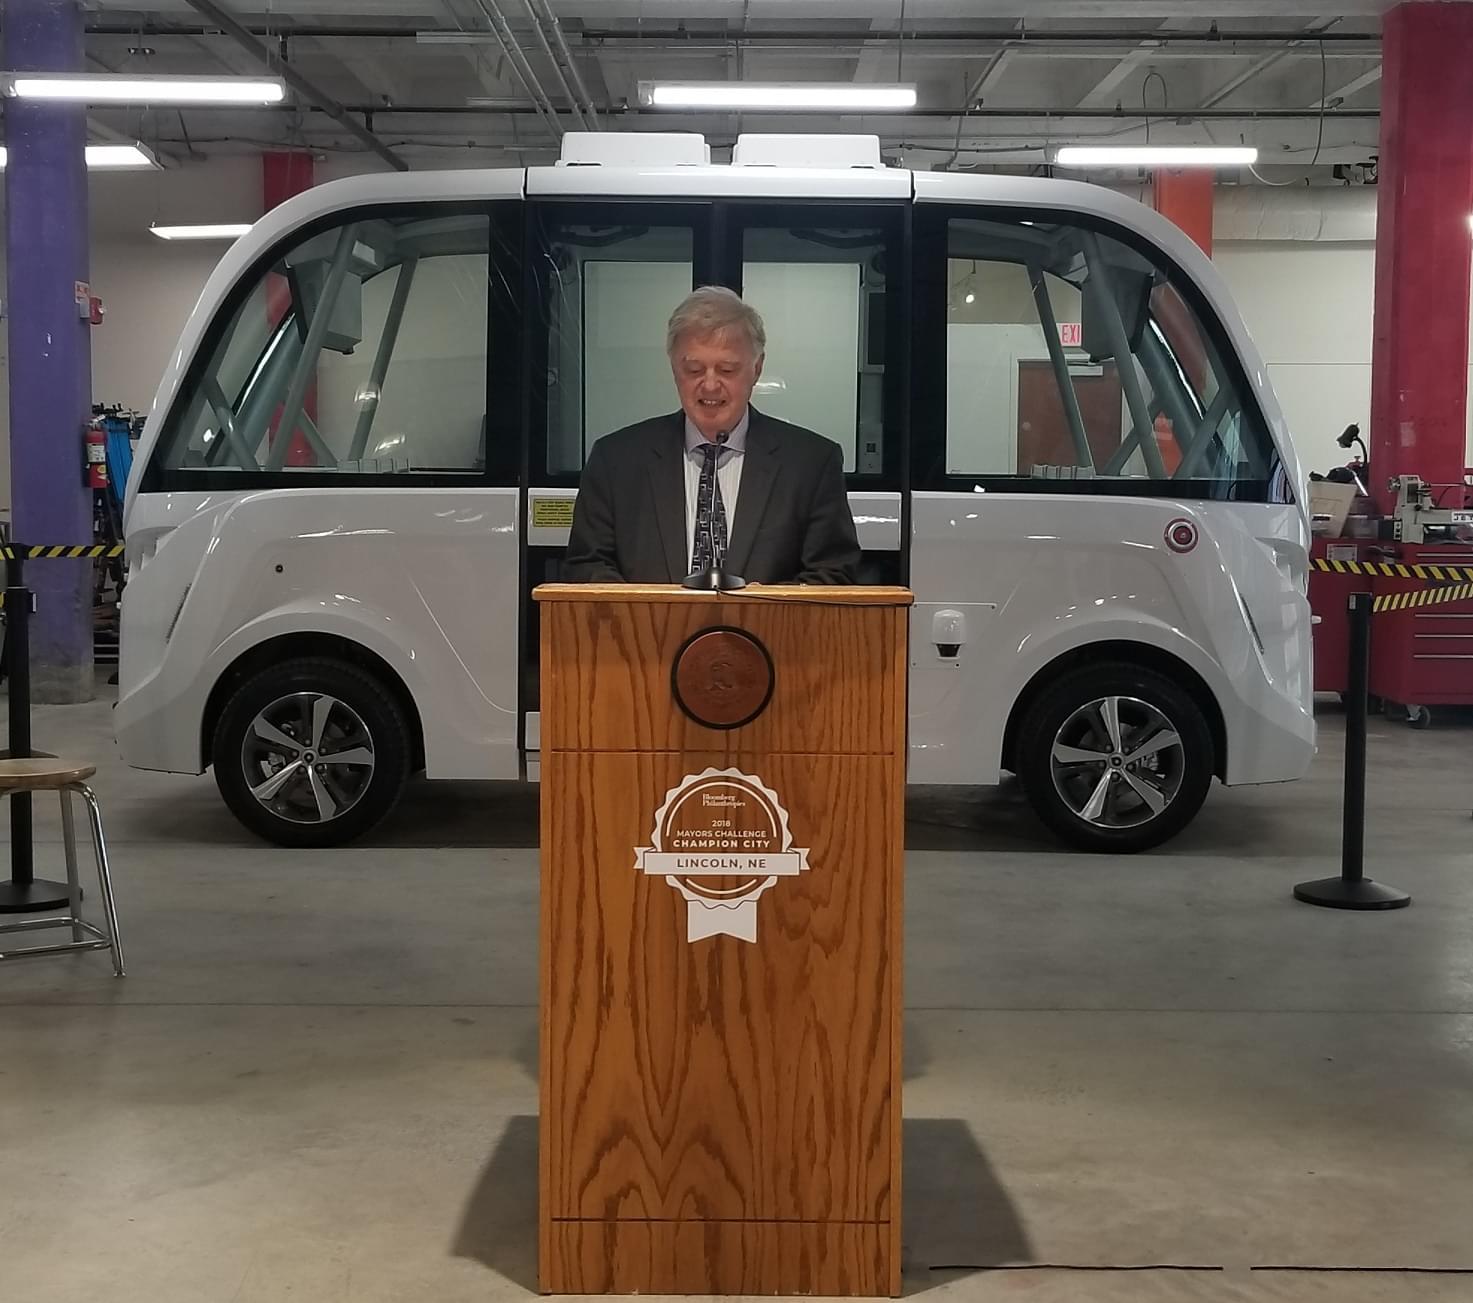 Mayor Beutler Gives Updates On Next Phase Of Bloomberg Mayor's Challenge; Presents Navya Self Driving Shuttle